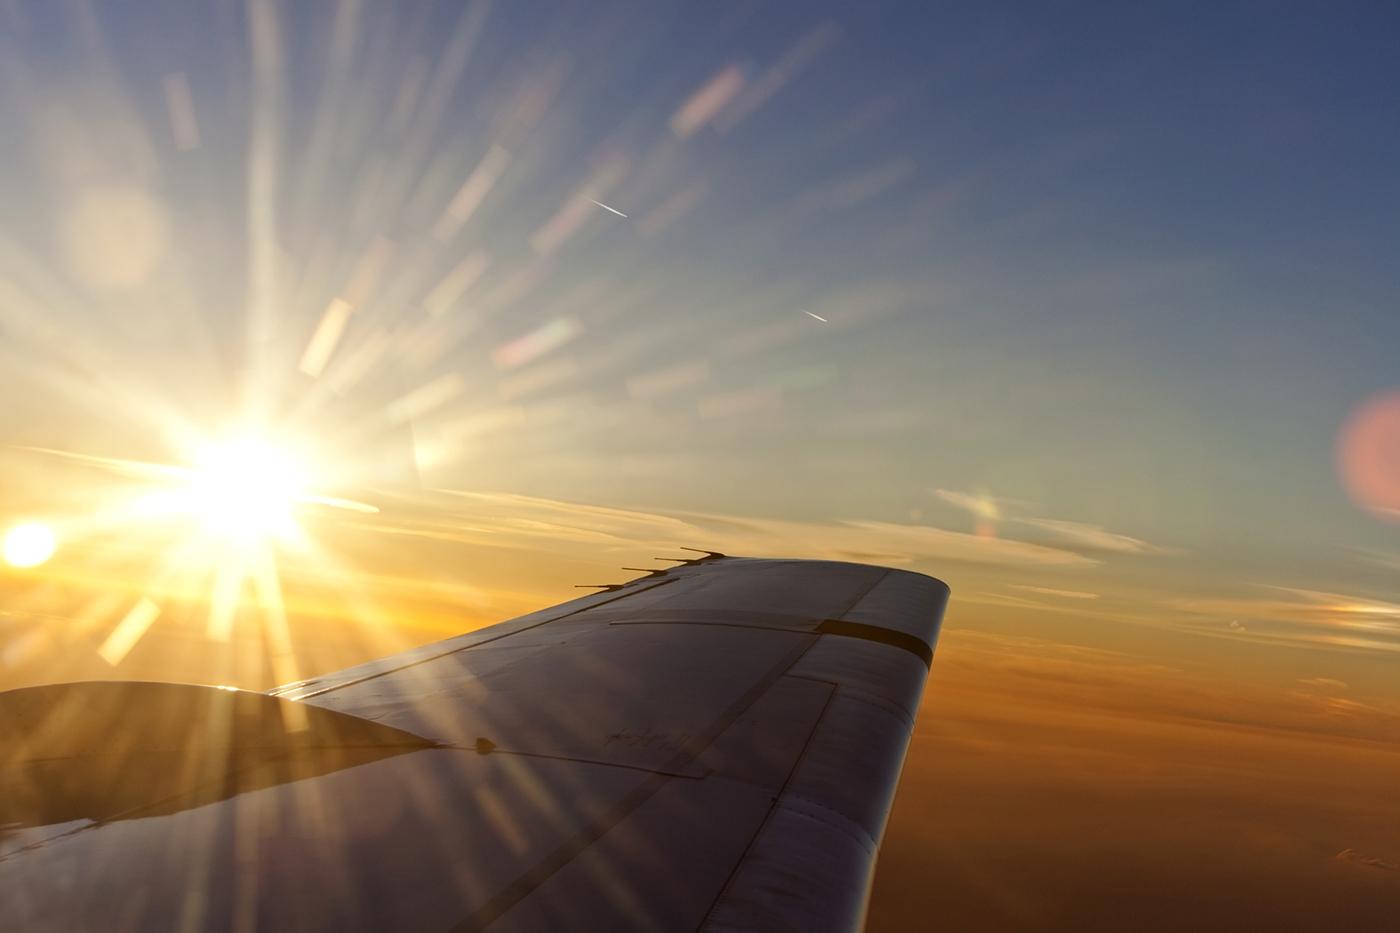 Kunststoff-Verarbeitung im Flugzeugbau